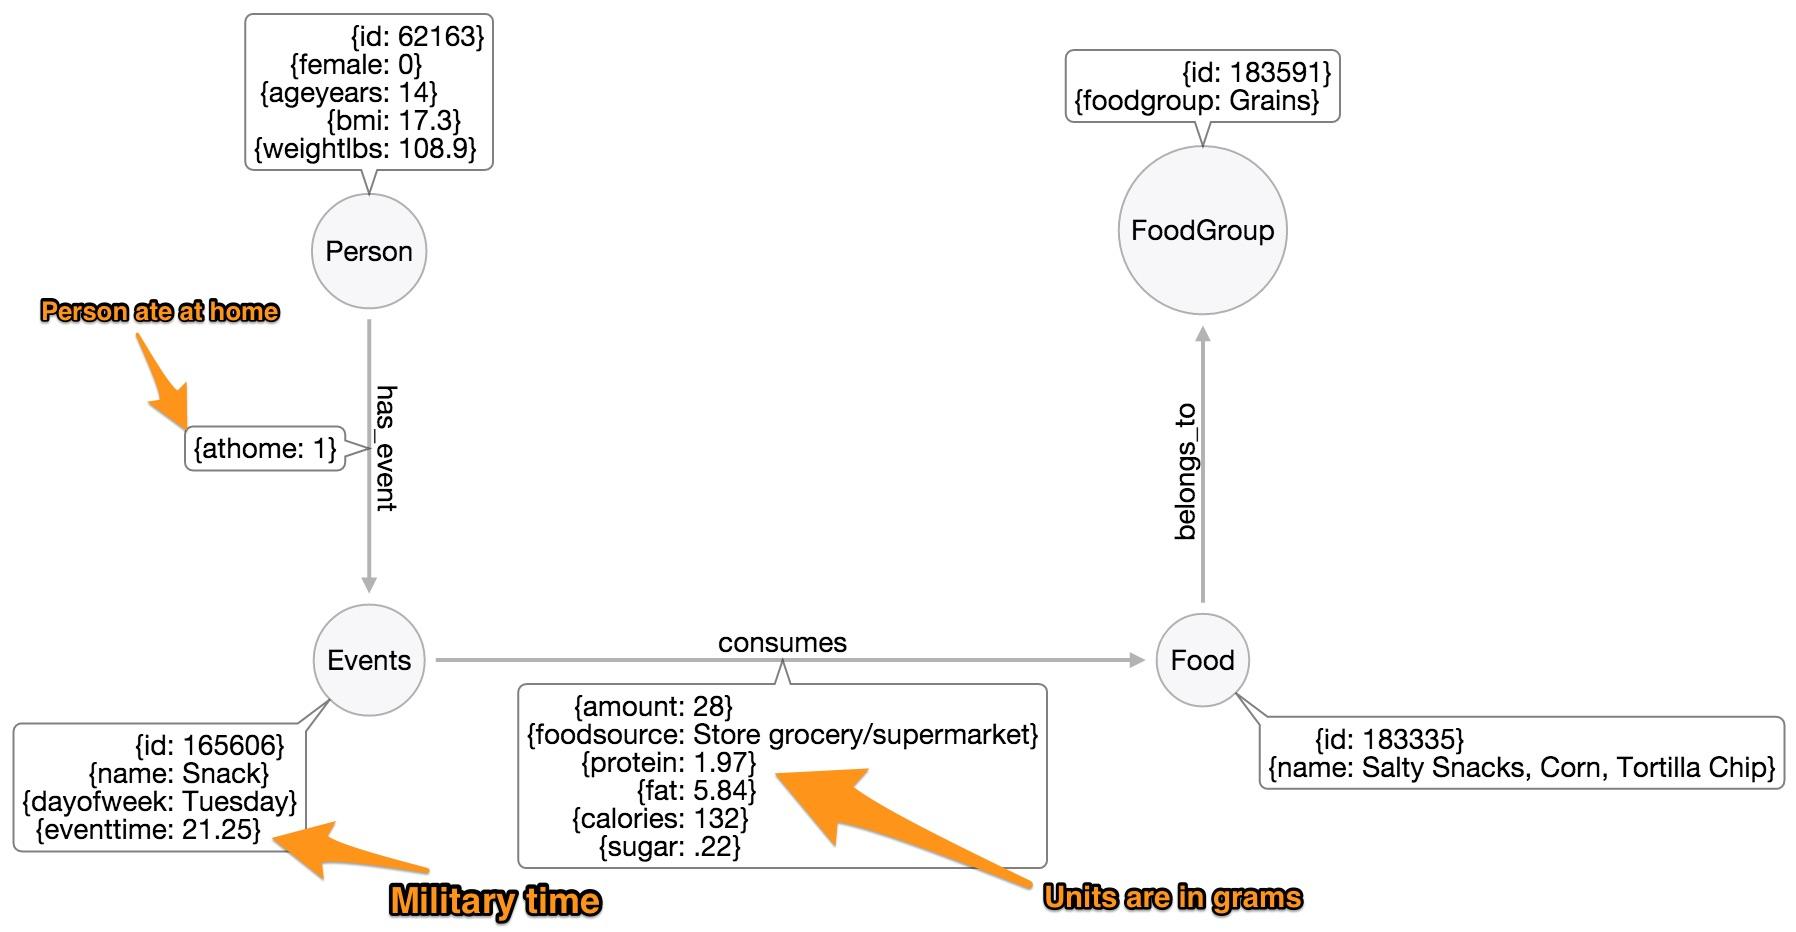 AnnotatedModel